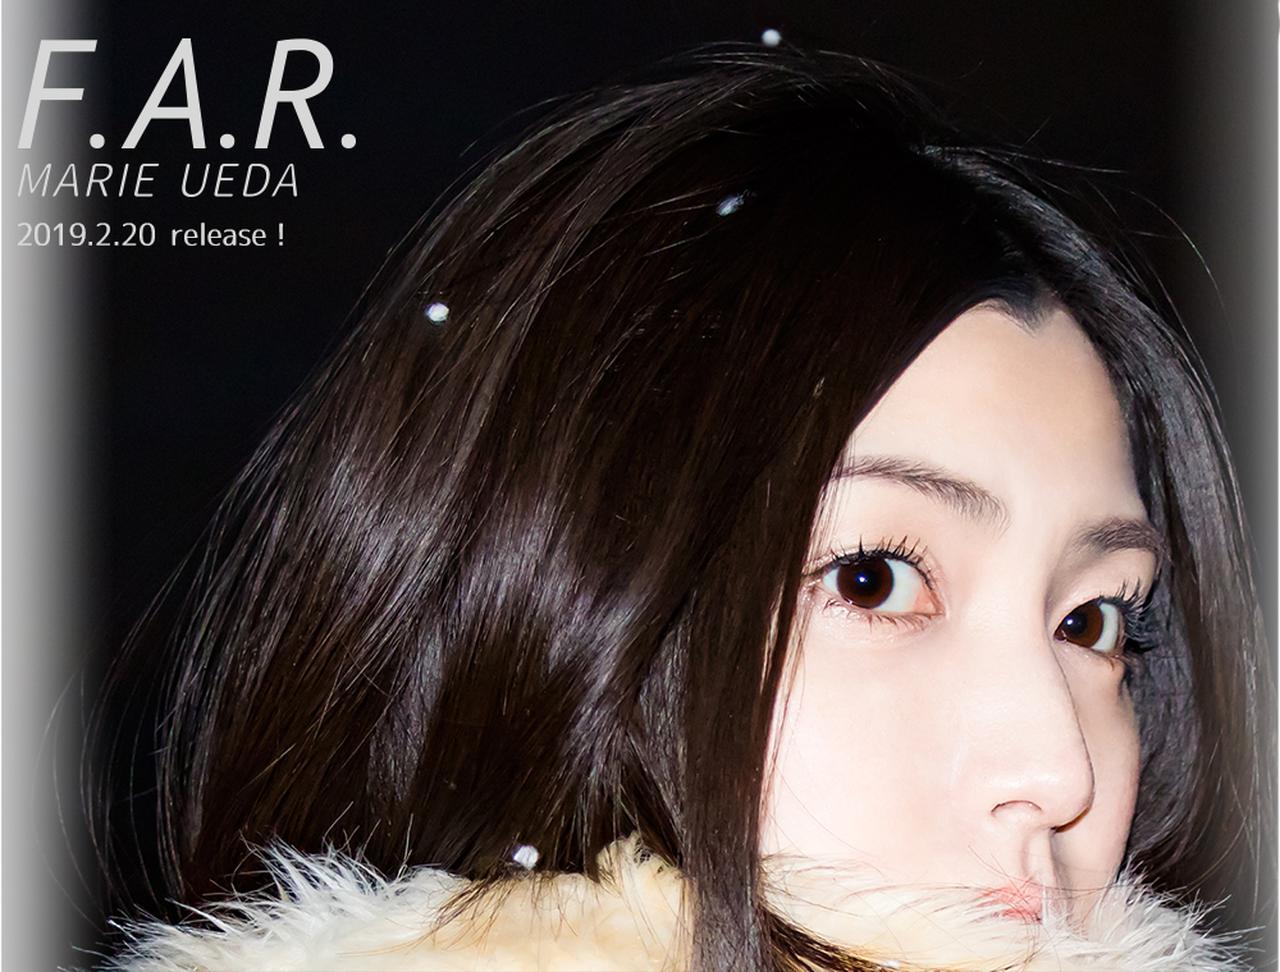 画像: Mini AL『F.A.R.』2019.2.20 Release!!:植田真梨恵 Official Web Site